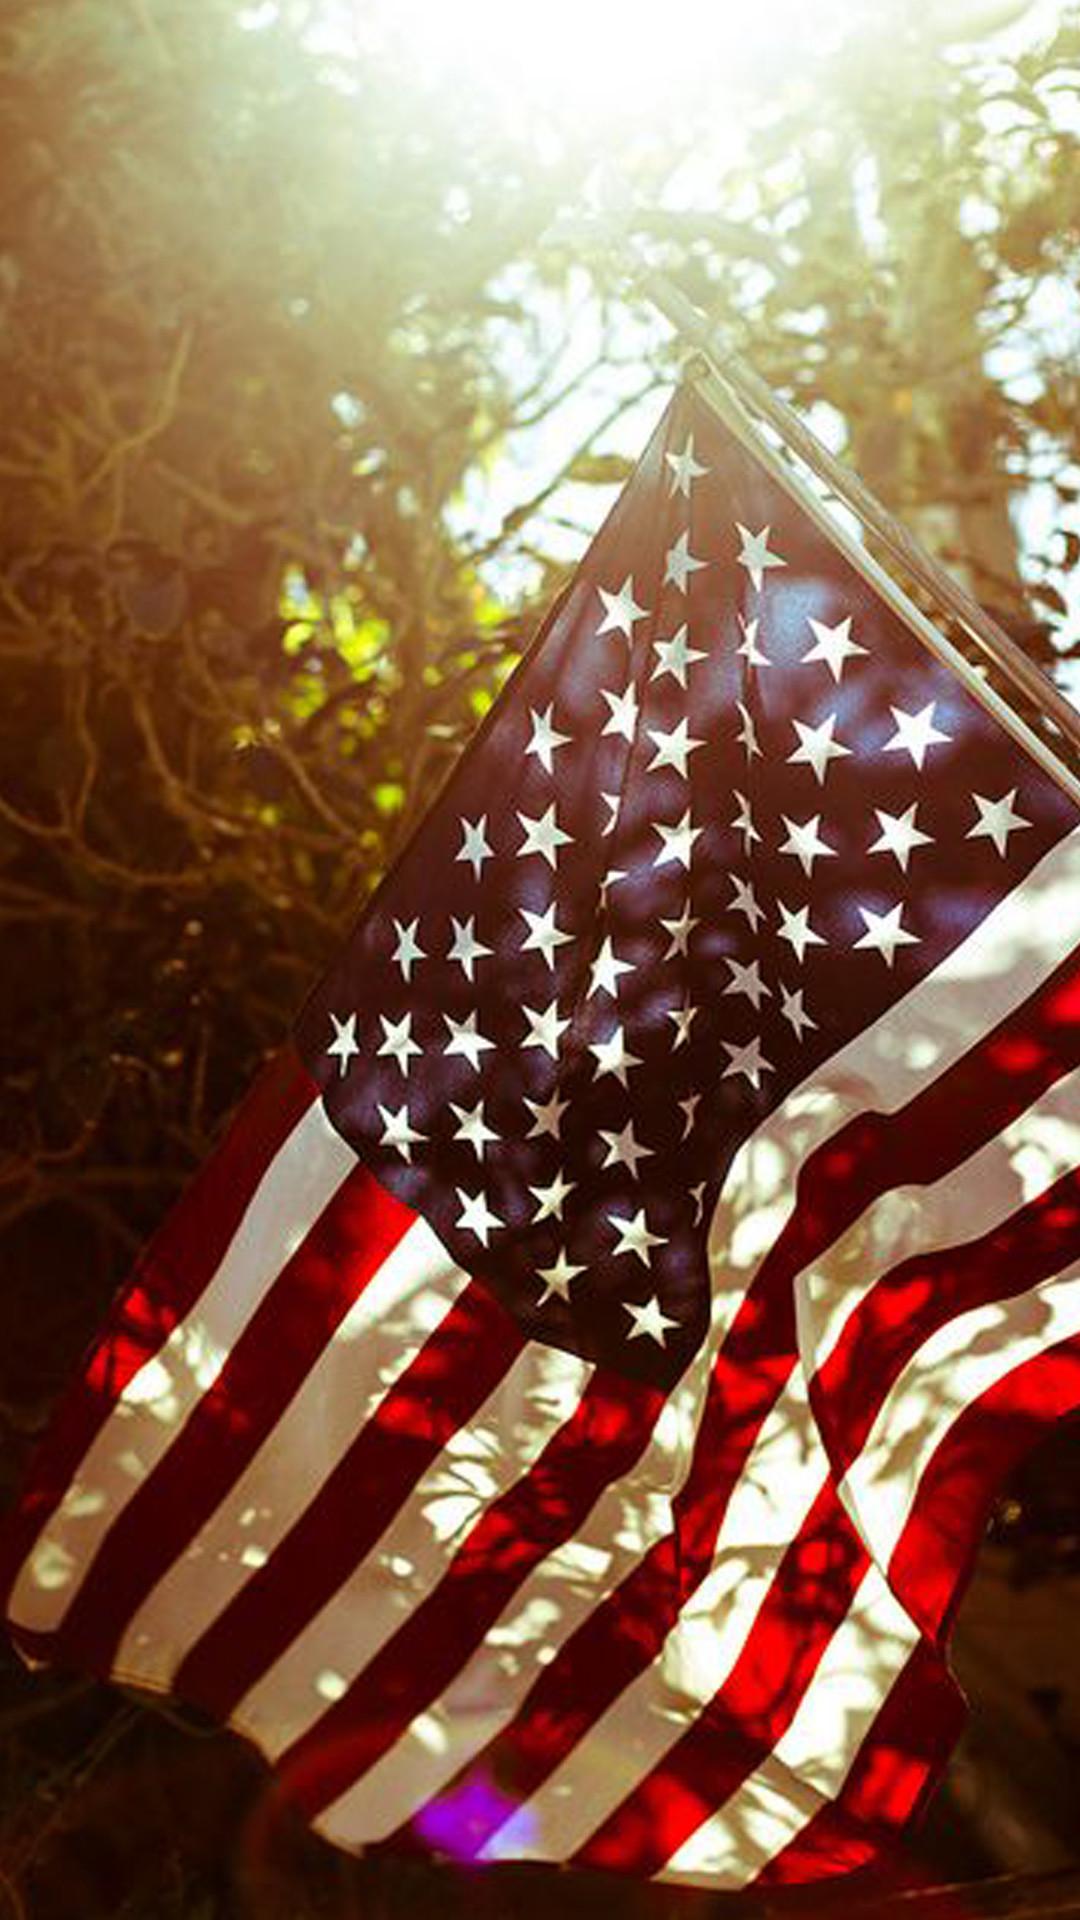 American Flag iphone 5 wallpaper hd